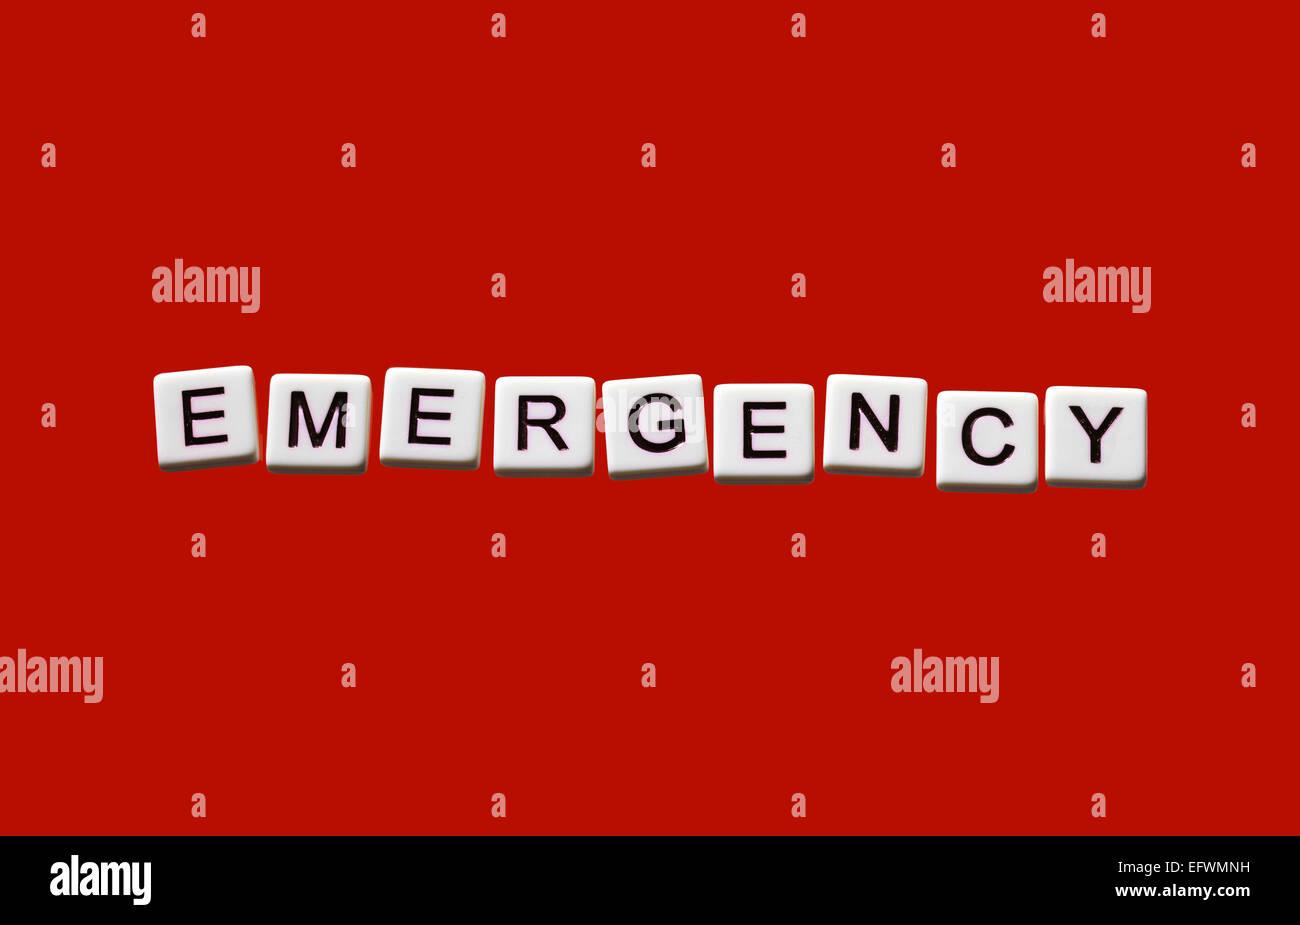 emergency highlighted on white blocks - Stock Image